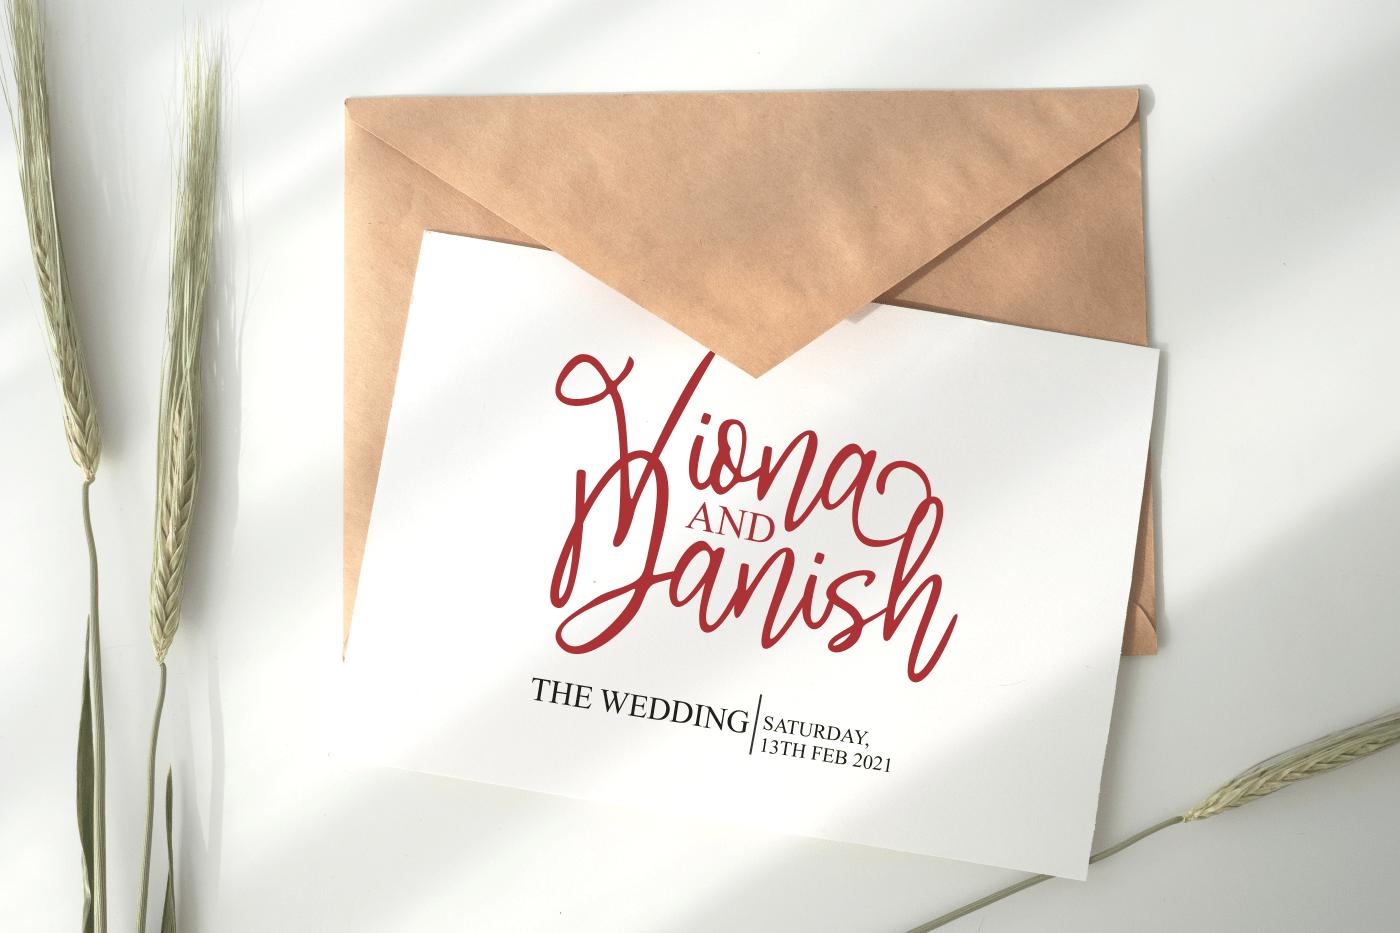 Saturday Wishes Stylish Handwritten Font -2